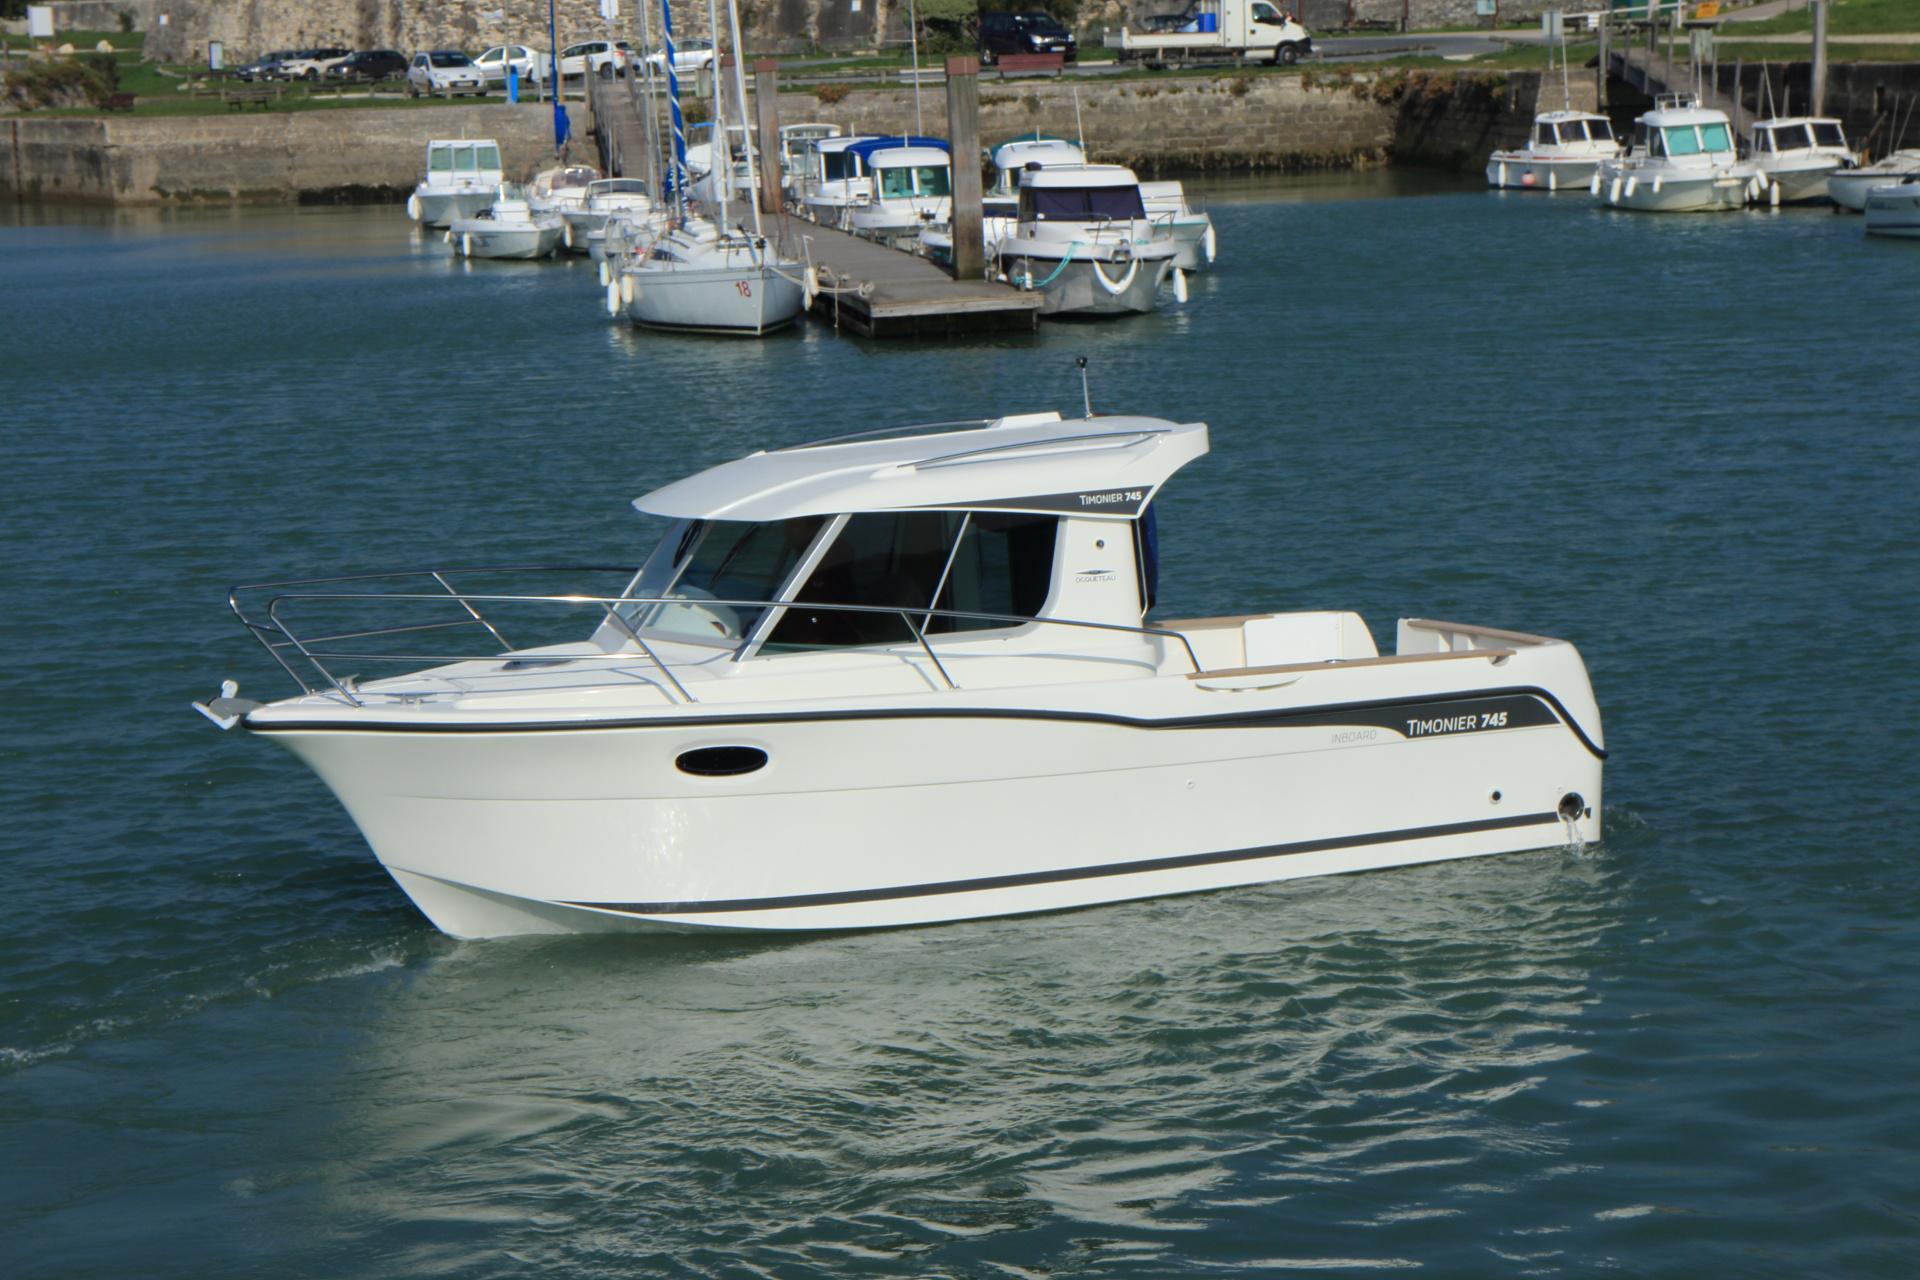 Motorboat Ocqueteau 745 Inboard Pilothouse Our Range